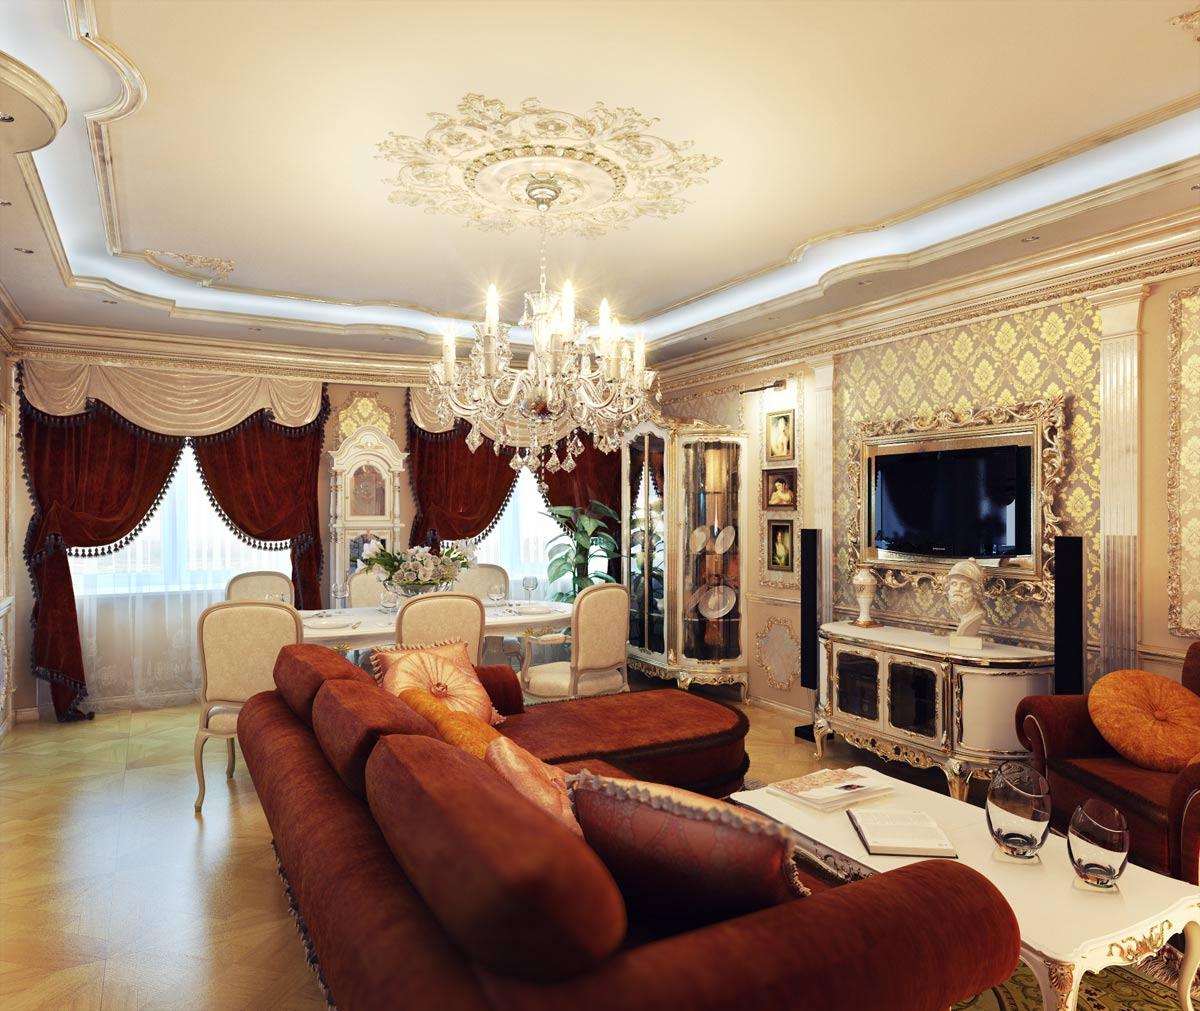 гостиная в стиле модерн фото оформление